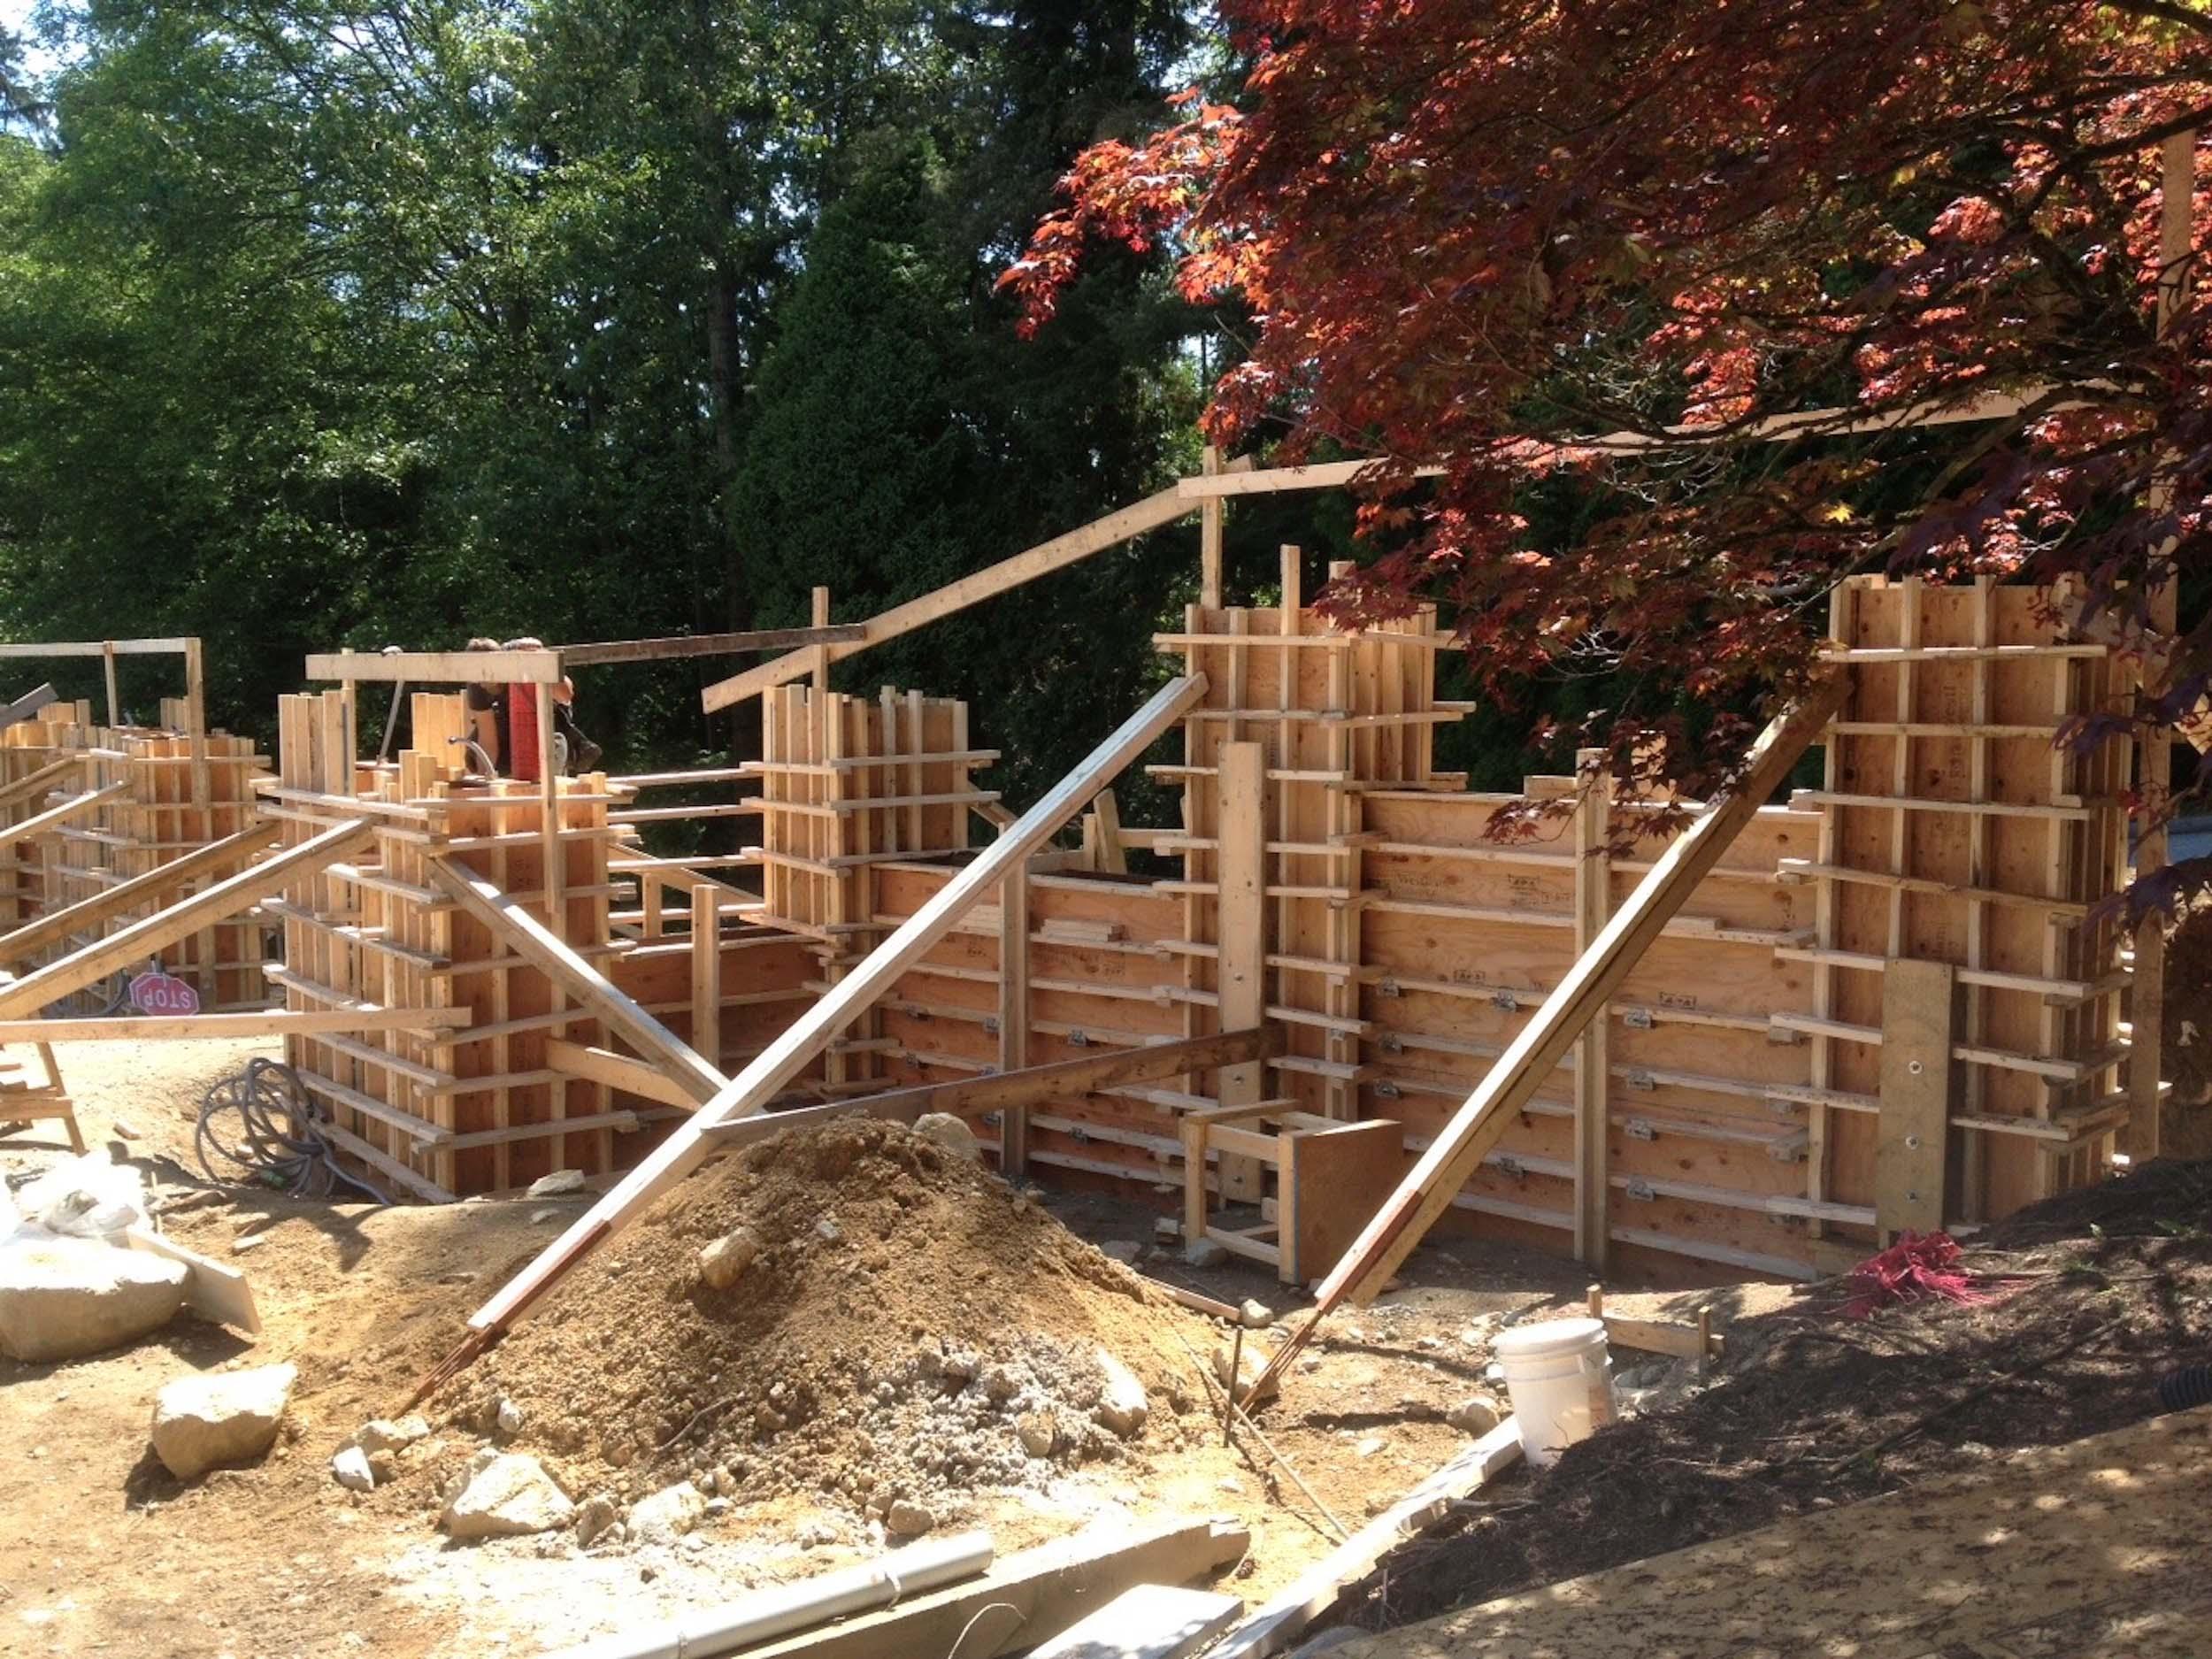 Postle_Construction_ConcreteForming36.jpg